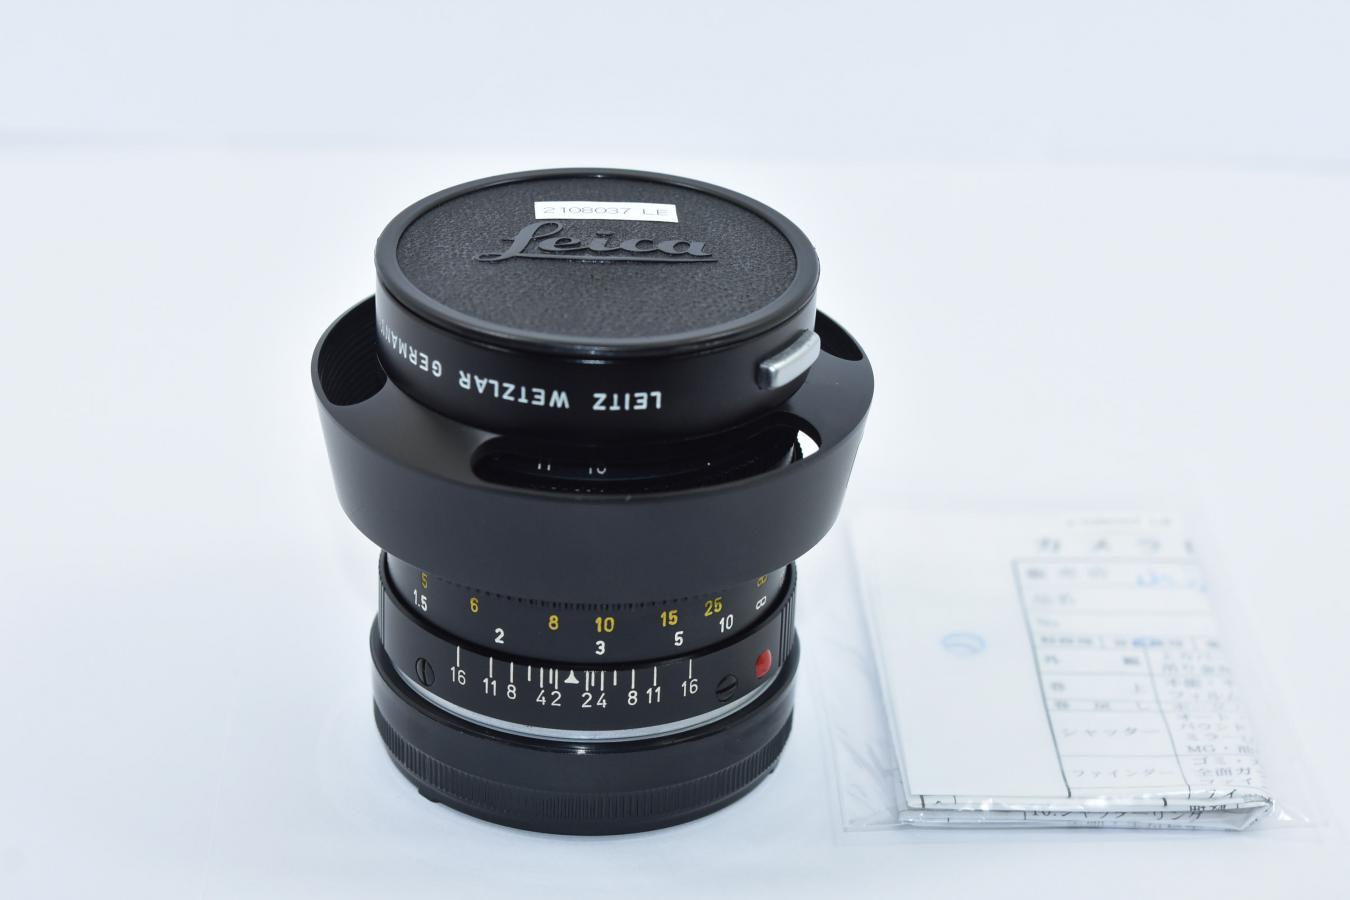 LEICA SUMMILUX-M 50mm F1.4 ブラック 整備済 純正フード12586付 【230万台 1968年製】